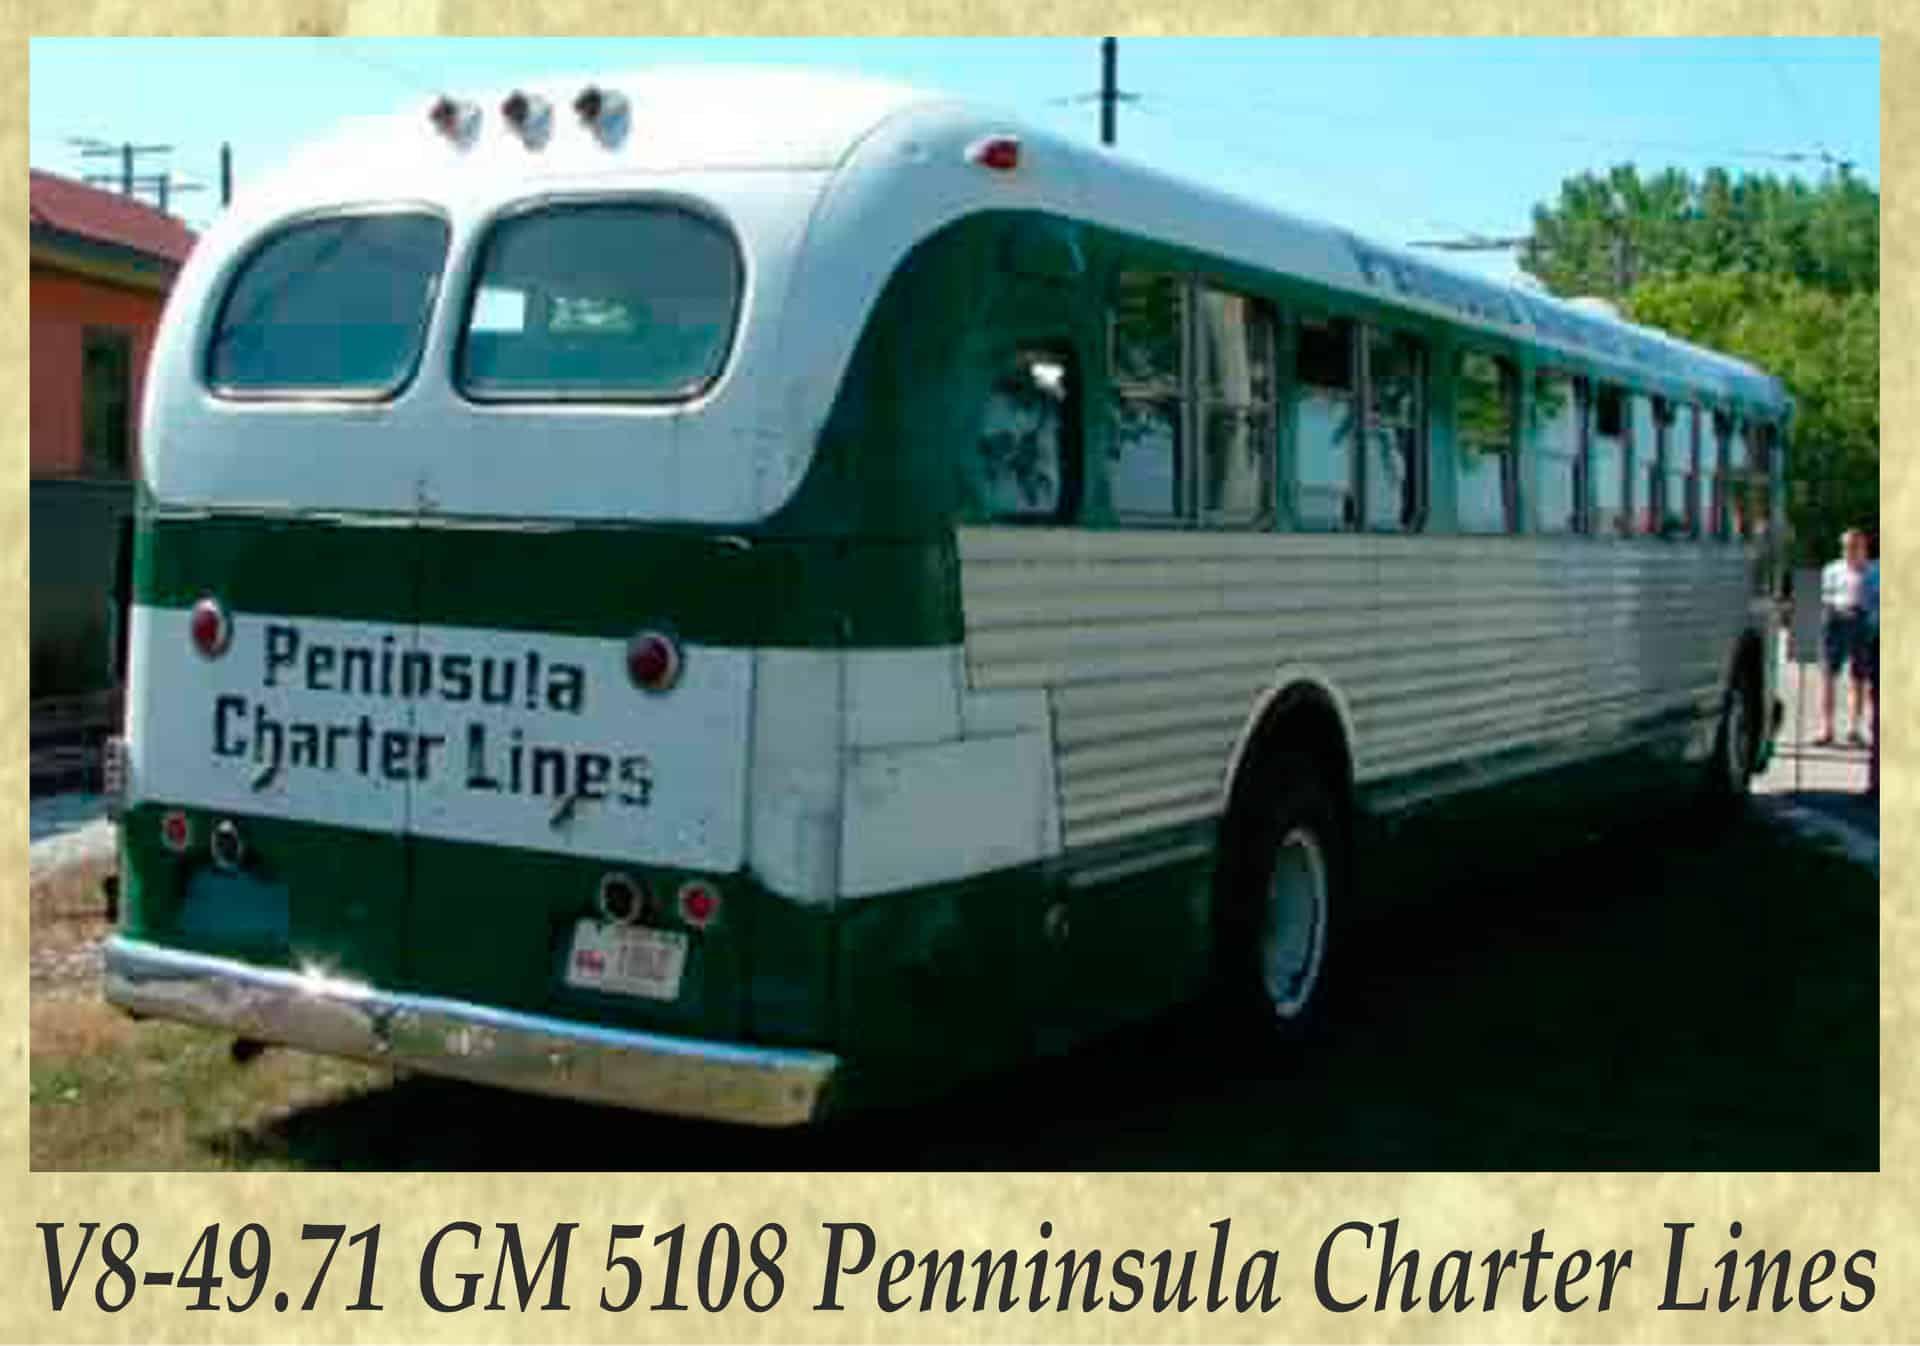 V8-49.71 GM 5108 Penninsula Charter Lines